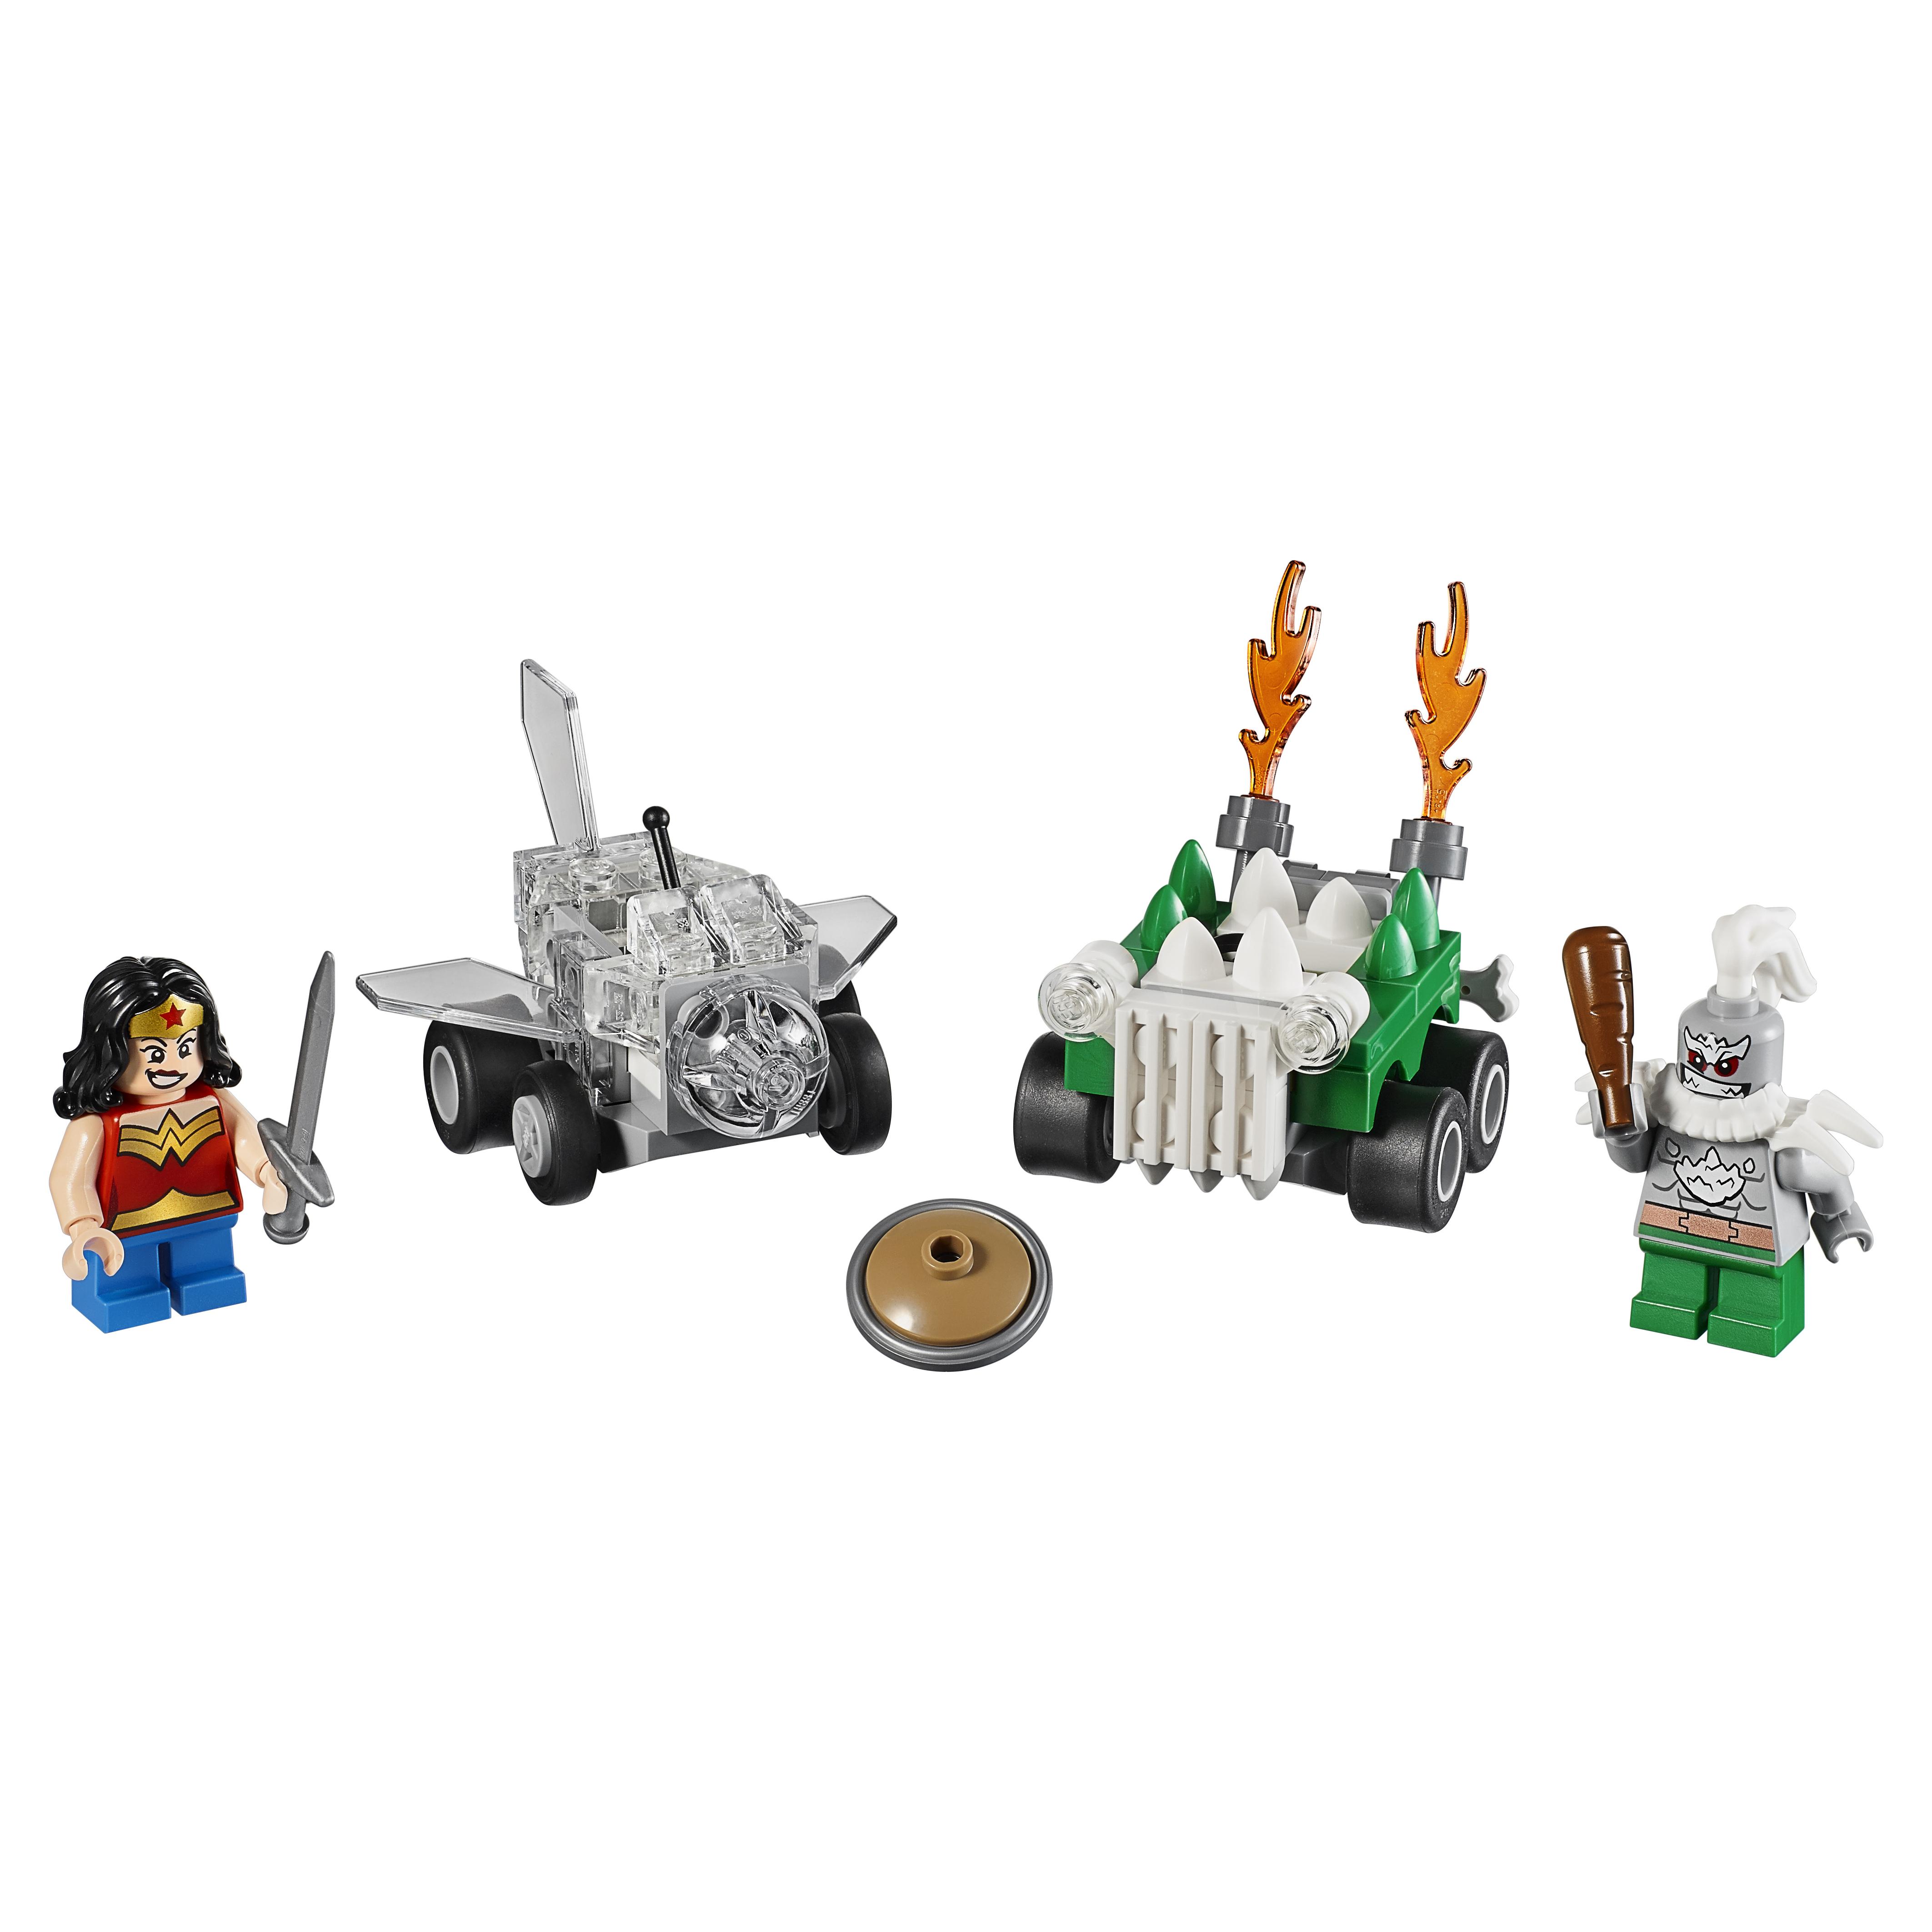 Конструктор LEGO Super Heroes Mighty Micros: Чудо-женщина против Думсдэя (76070)